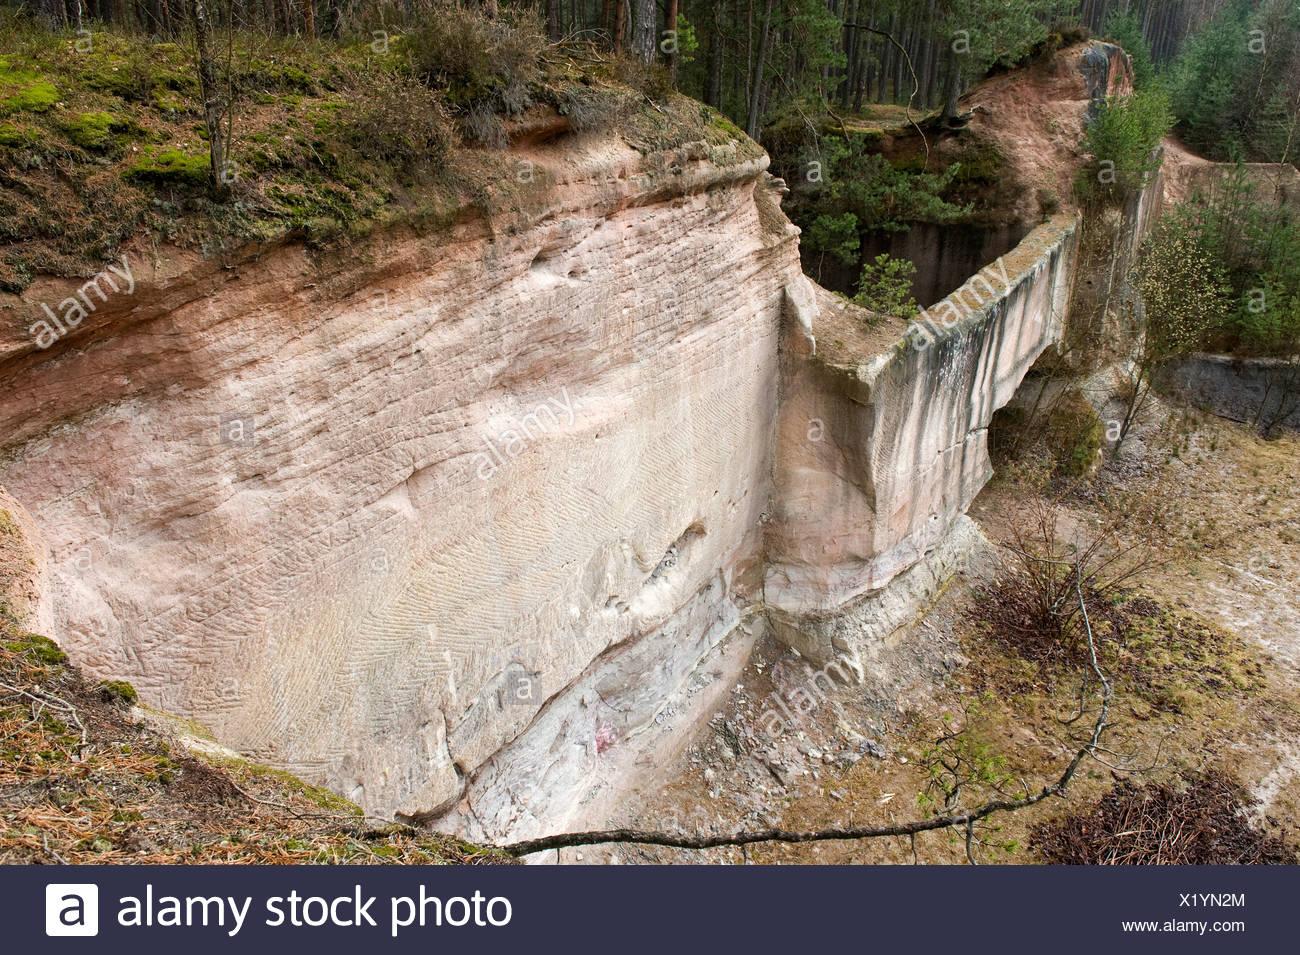 Sandstone quarry near Roth, Nuremberg, Germany, Europe Stock Photo